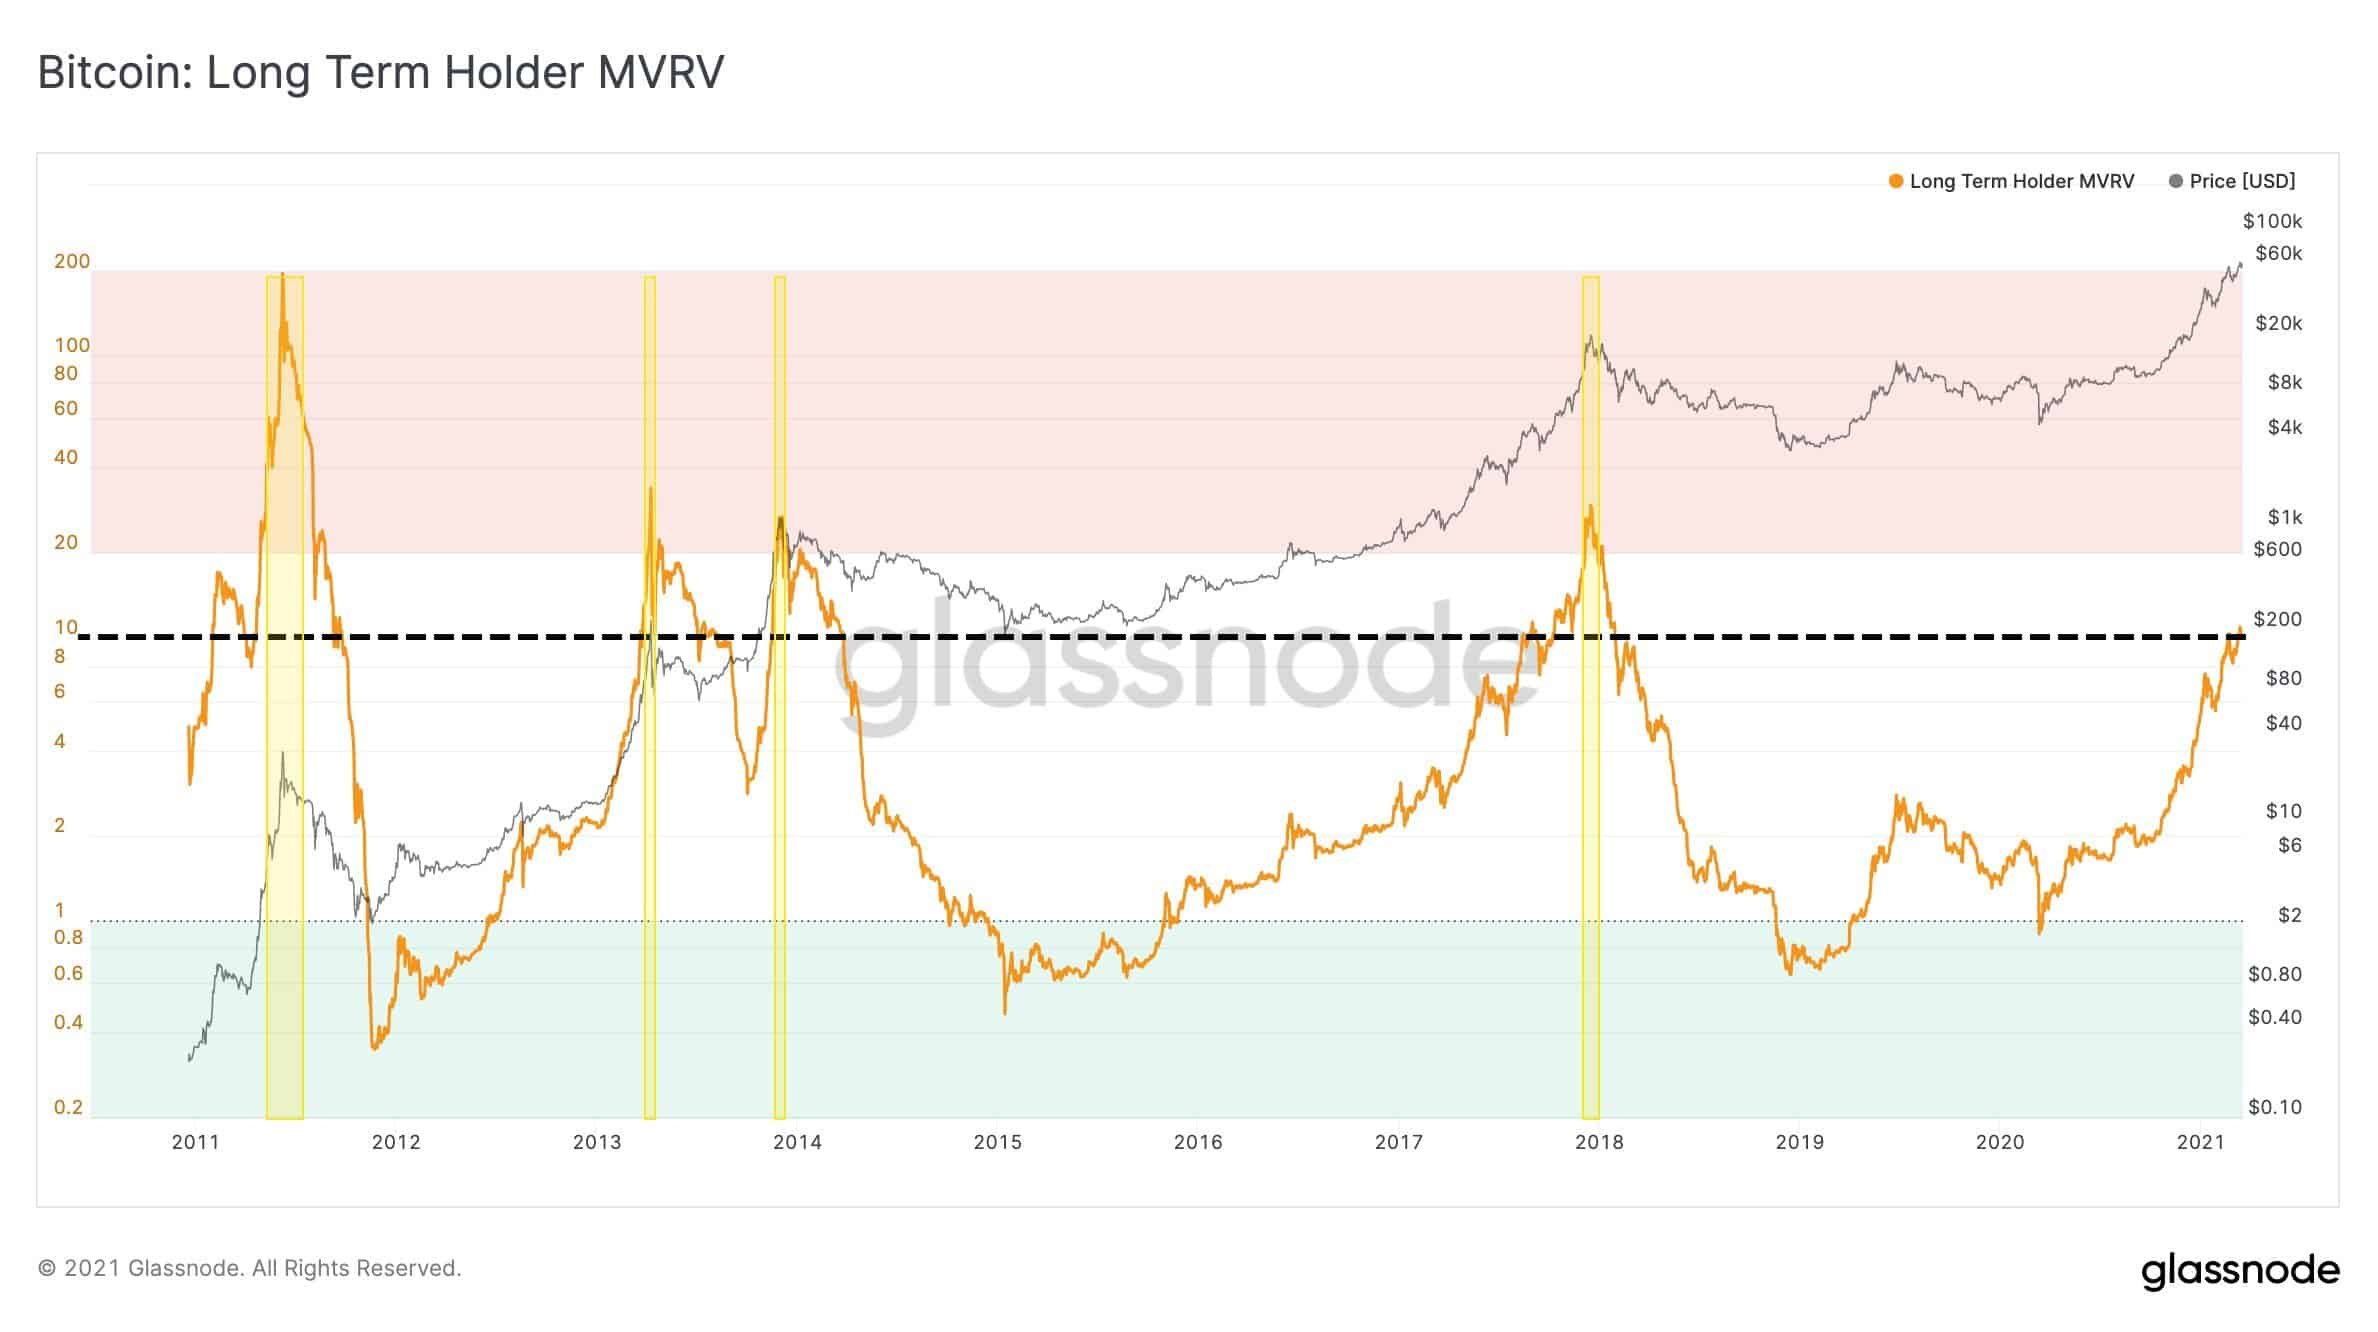 Bitcoin Long-Term Holder MVRV Metric. Source: Glassnode